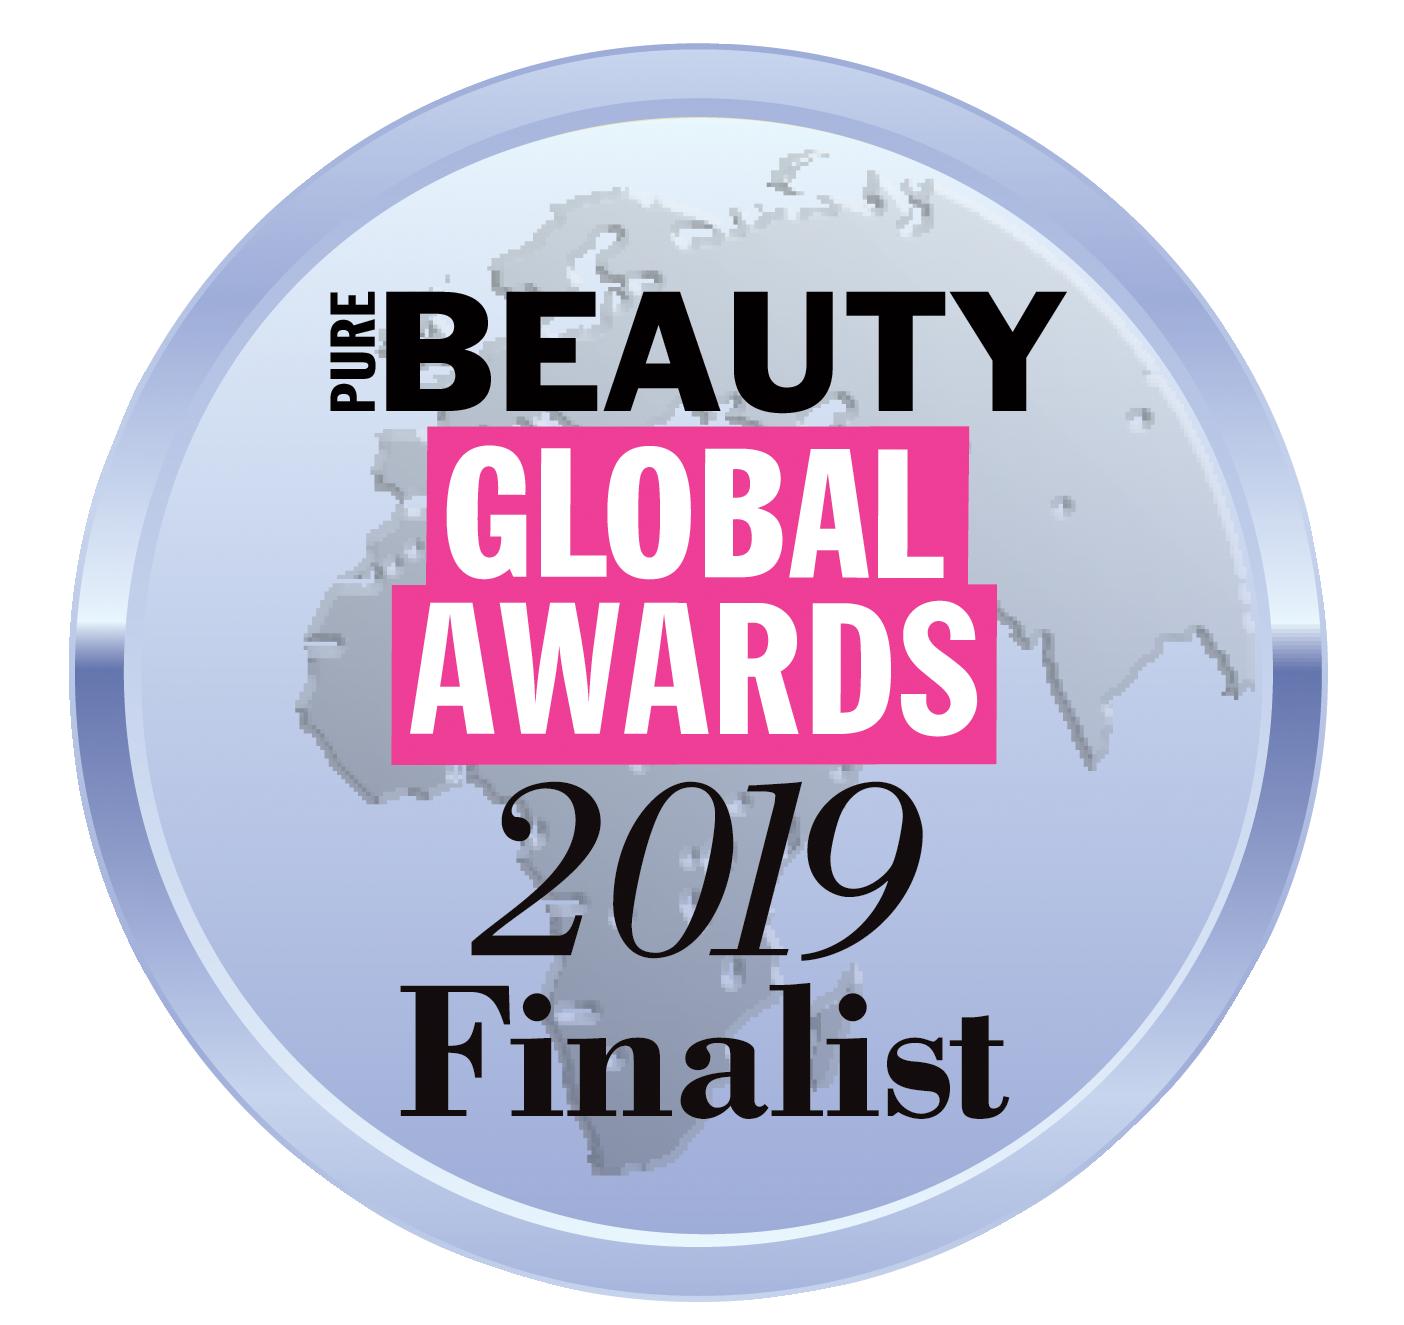 PB_Global_Awards_Finalist_2019 (1).png